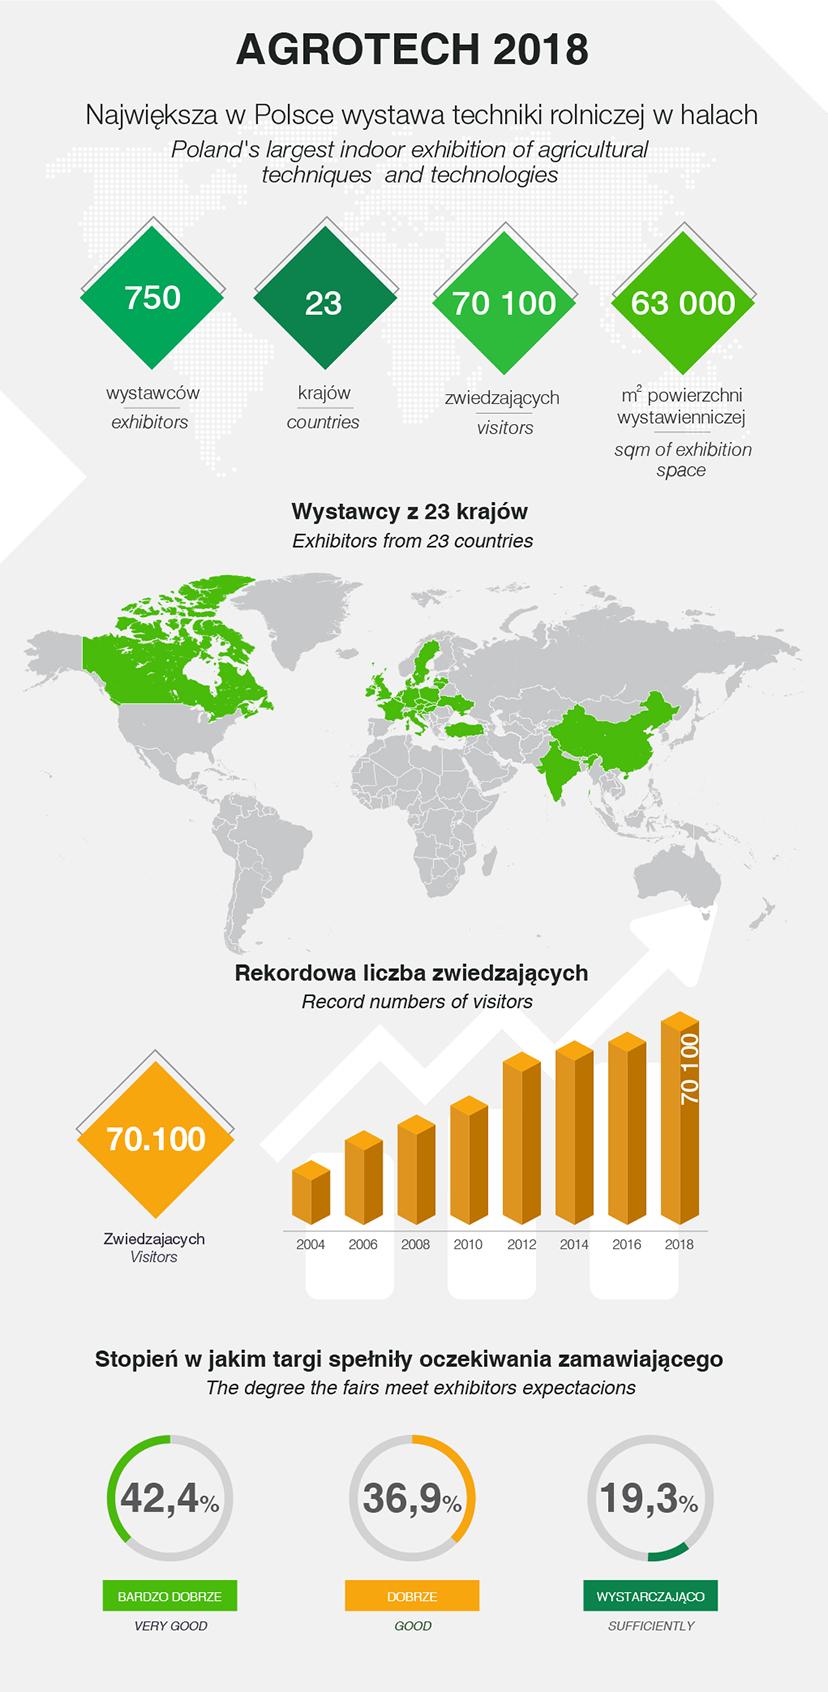 agrotech 2018 - statystyki (infografika)